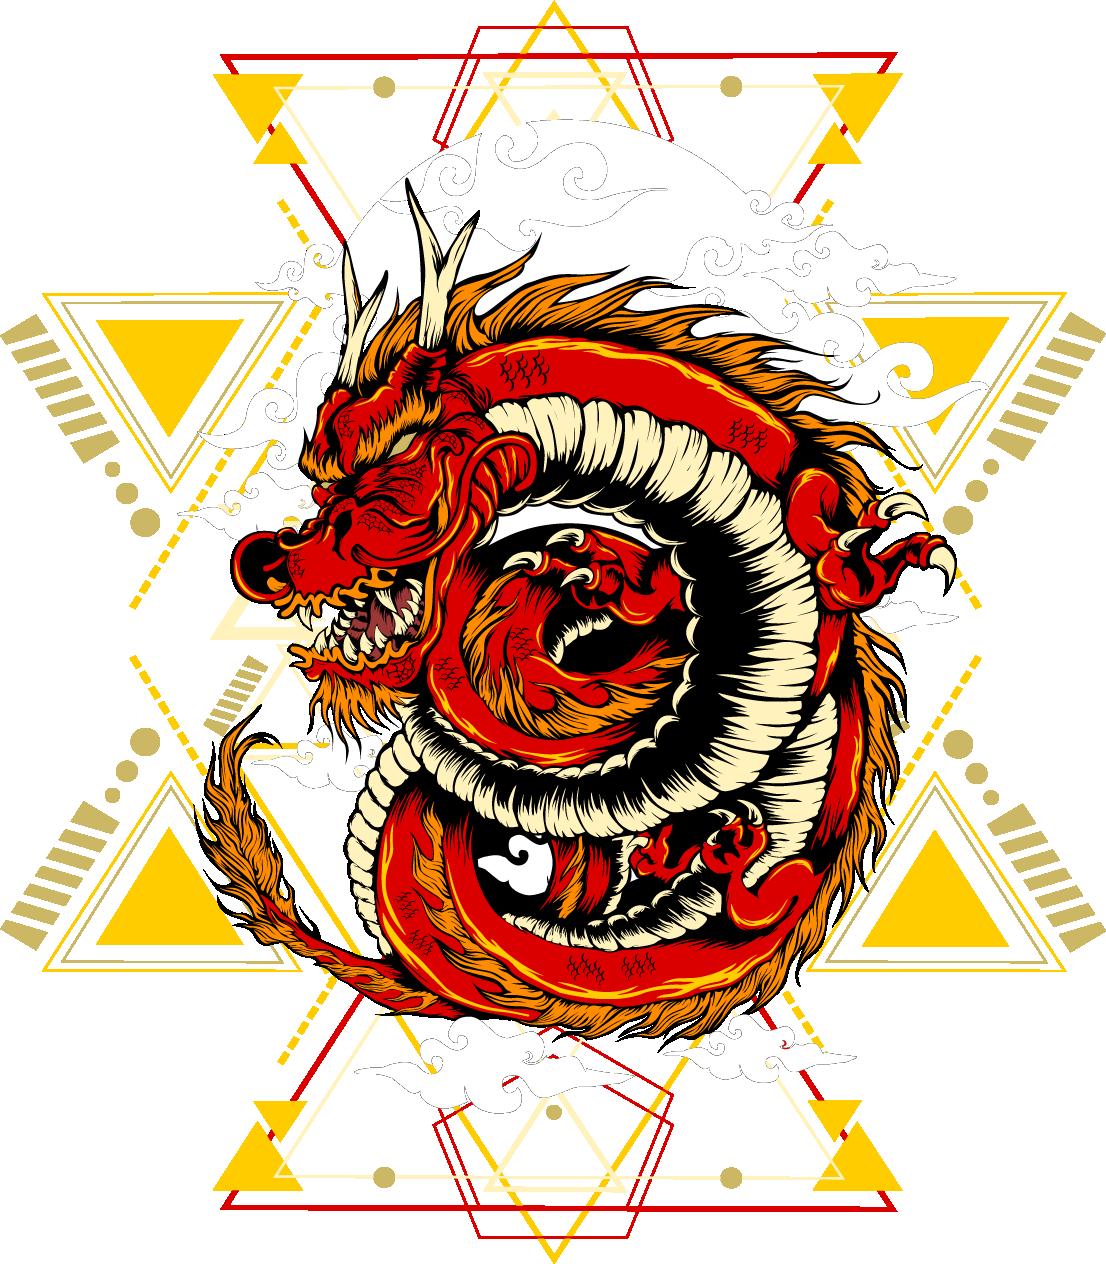 Drachen61